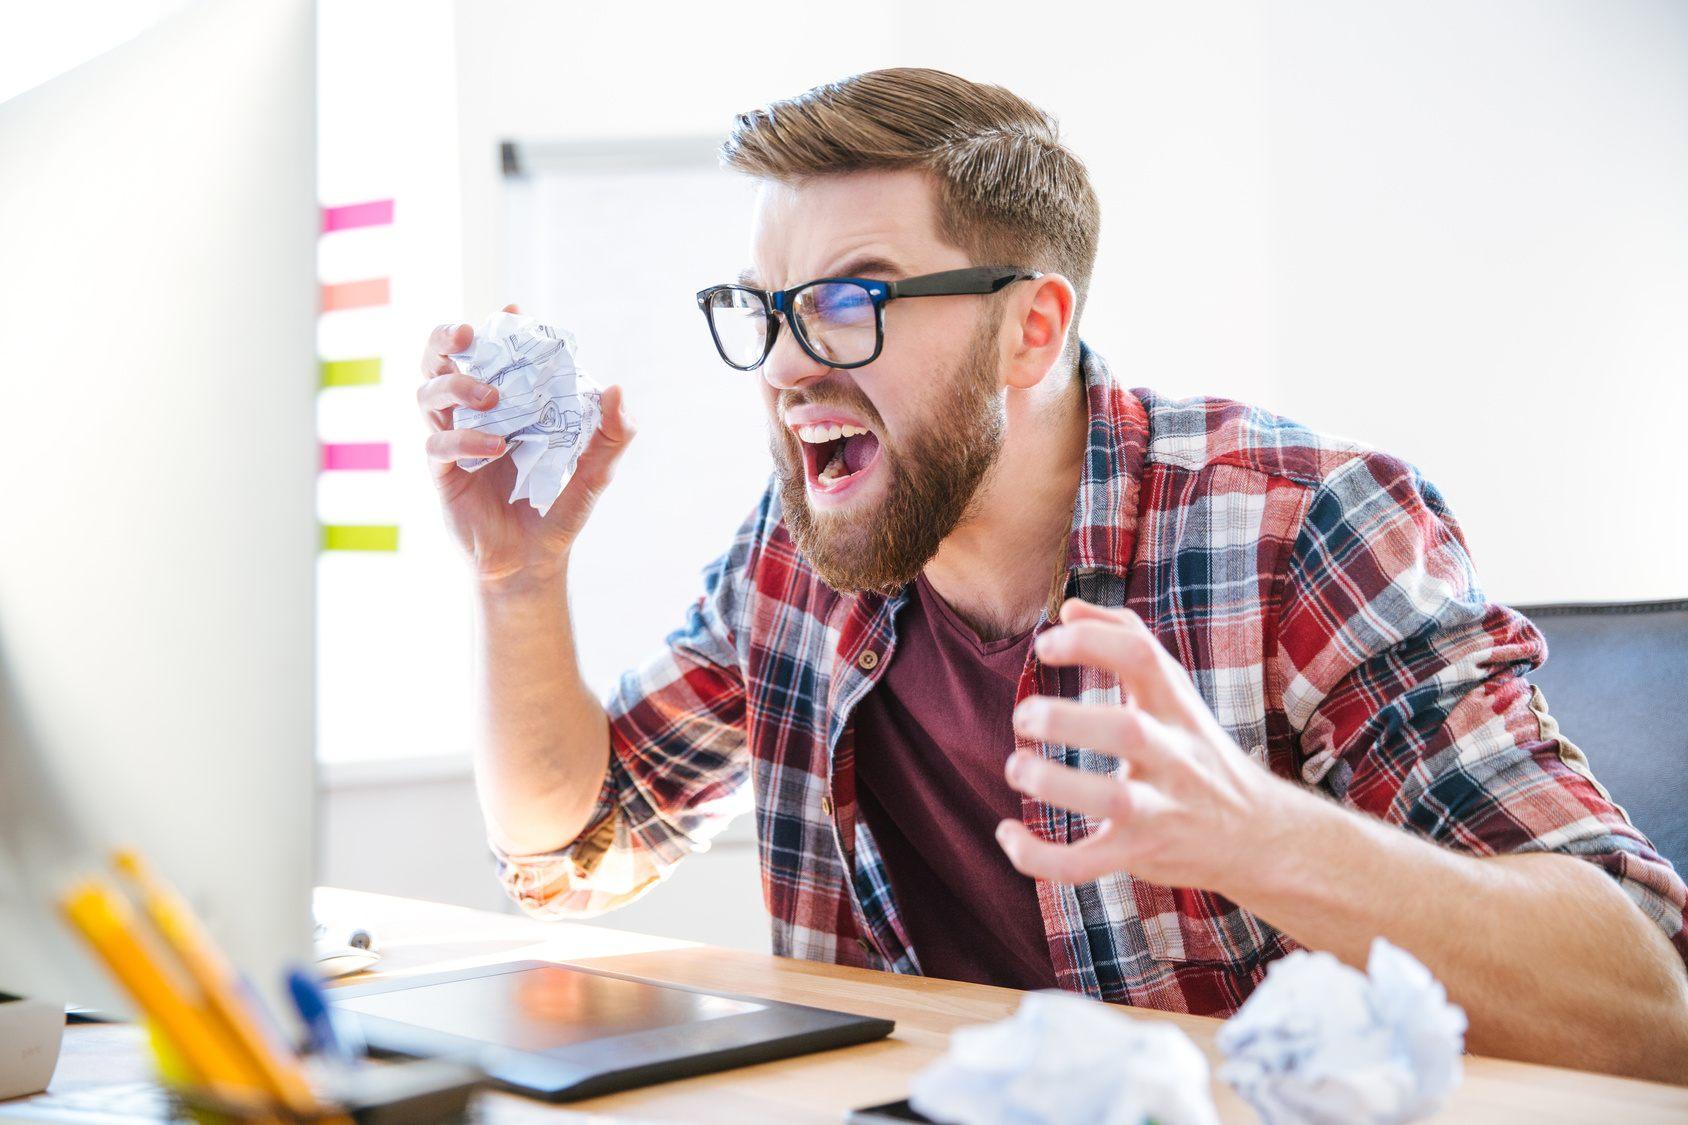 PhD student suffering writers' block